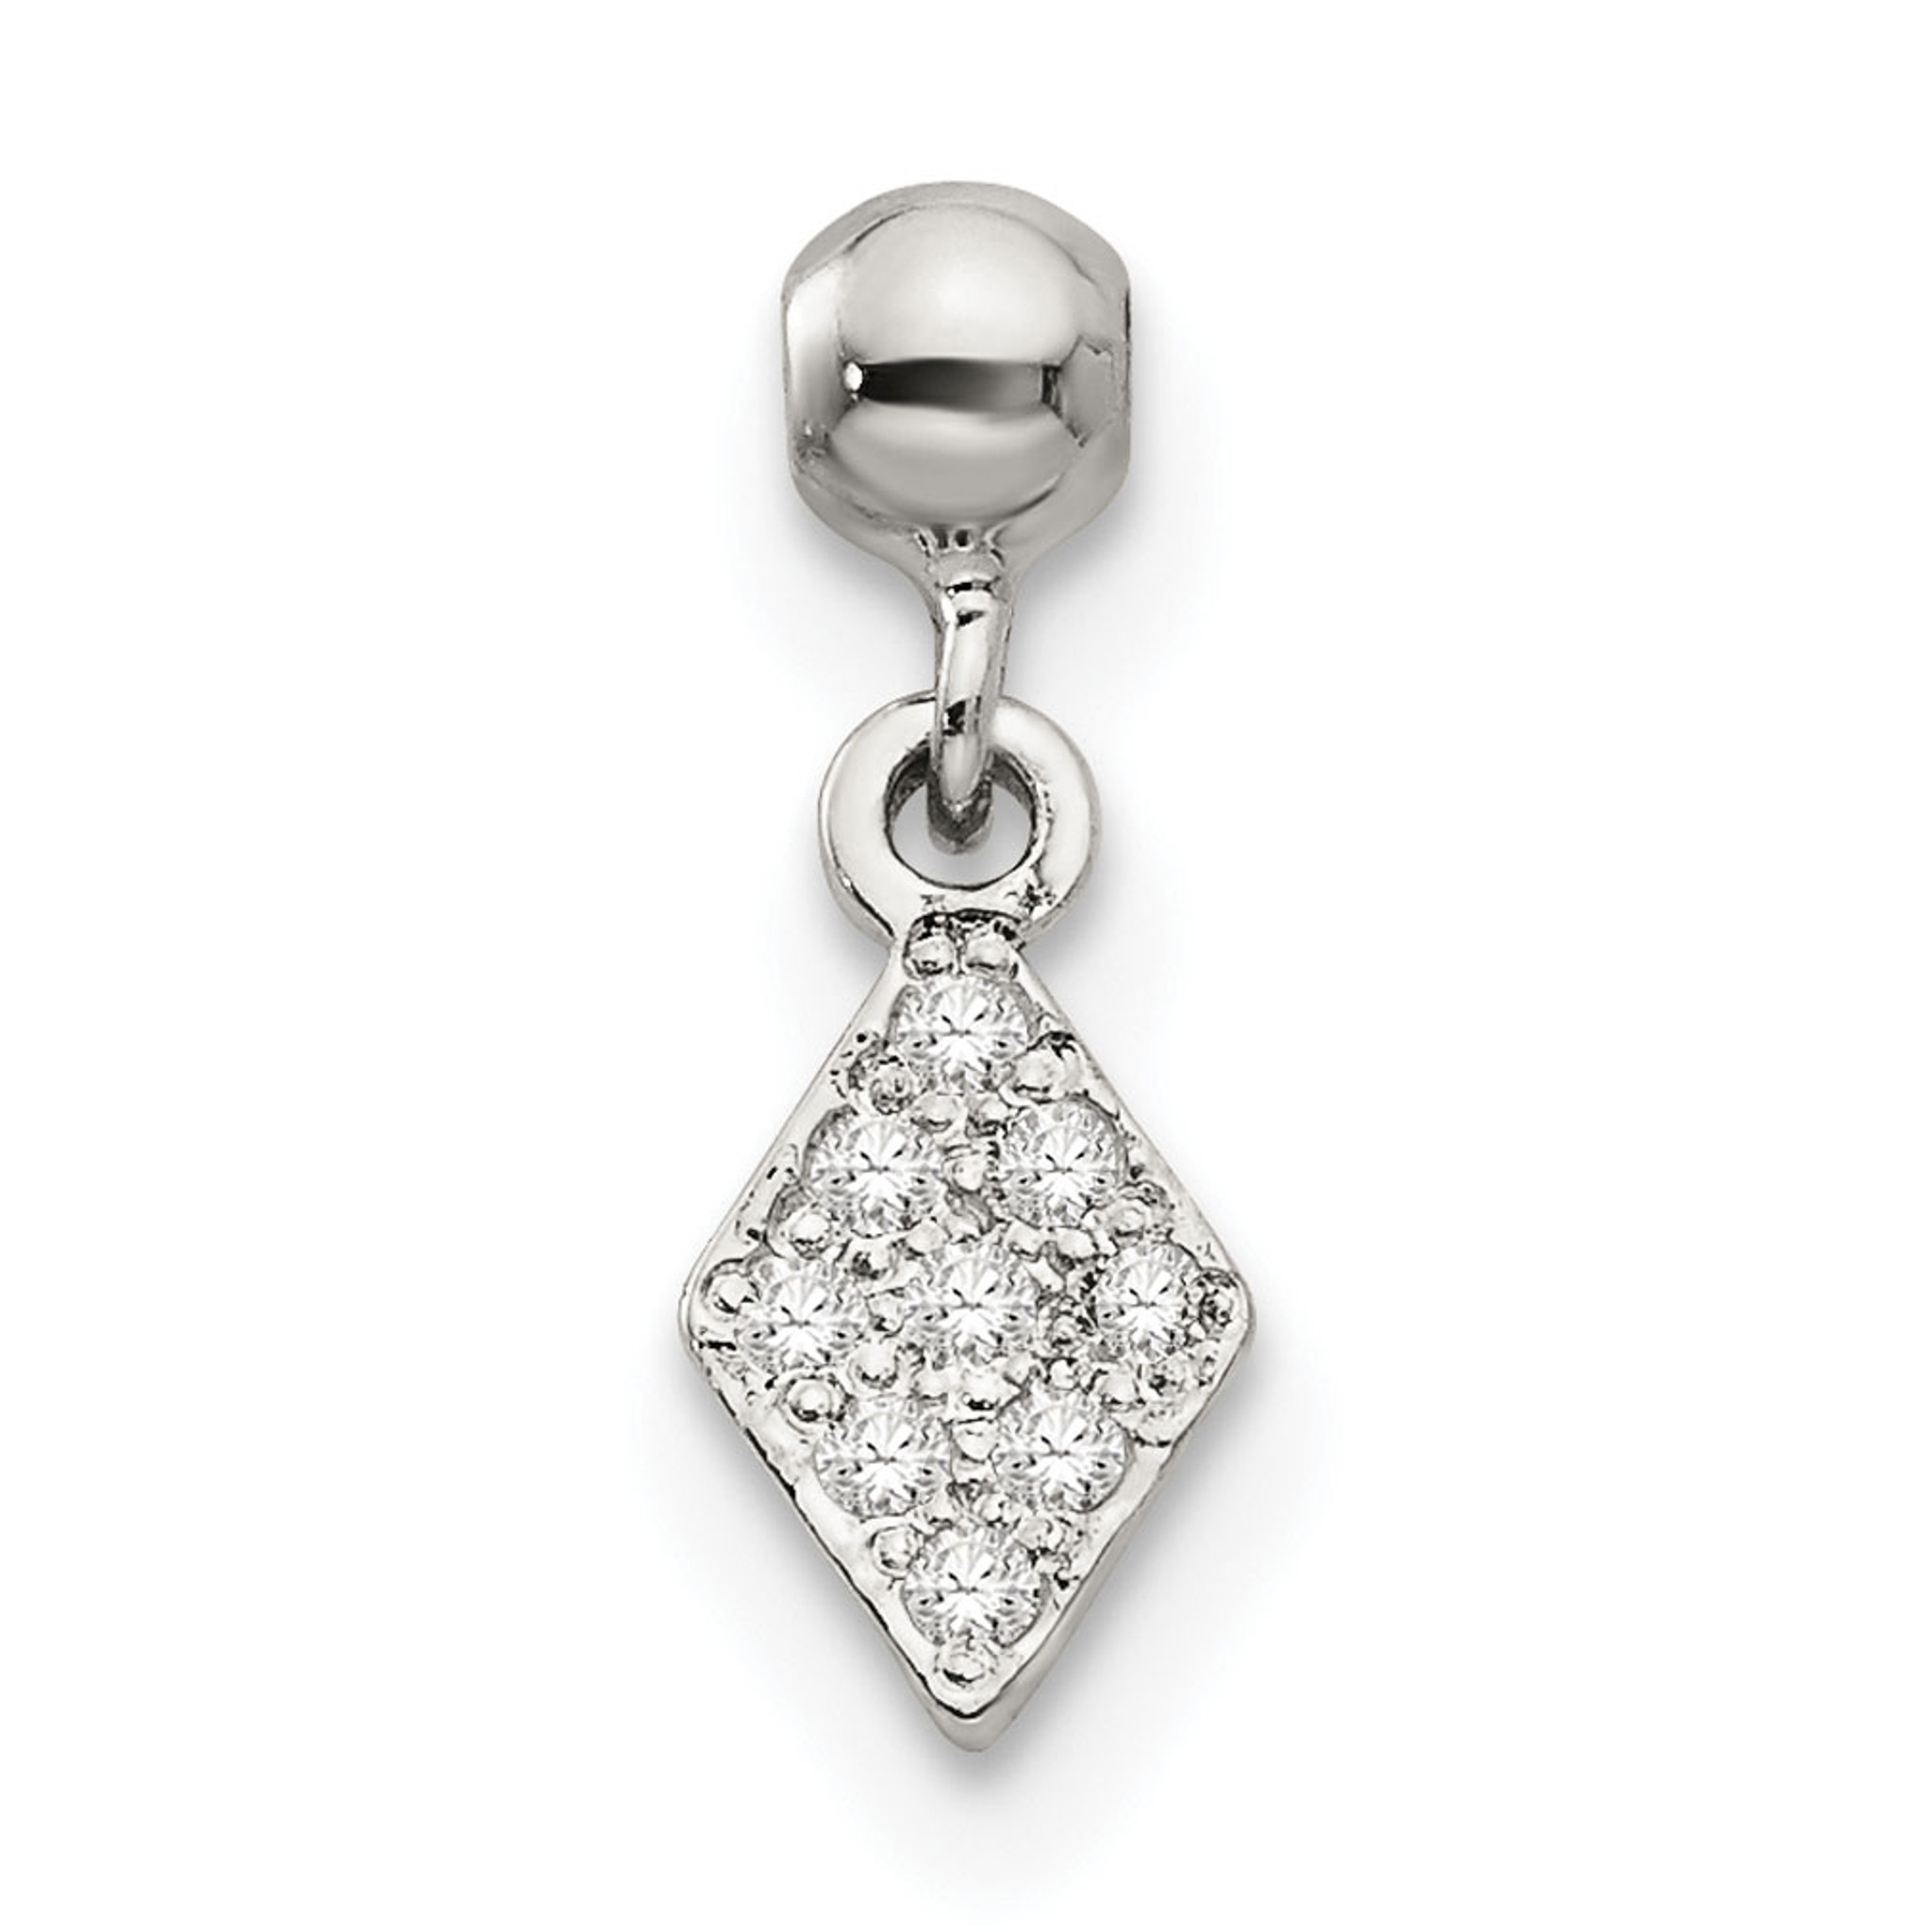 925 Sterling Silver w//CZ Horse Shoe Dangle Charm Pendant by Mio Memento